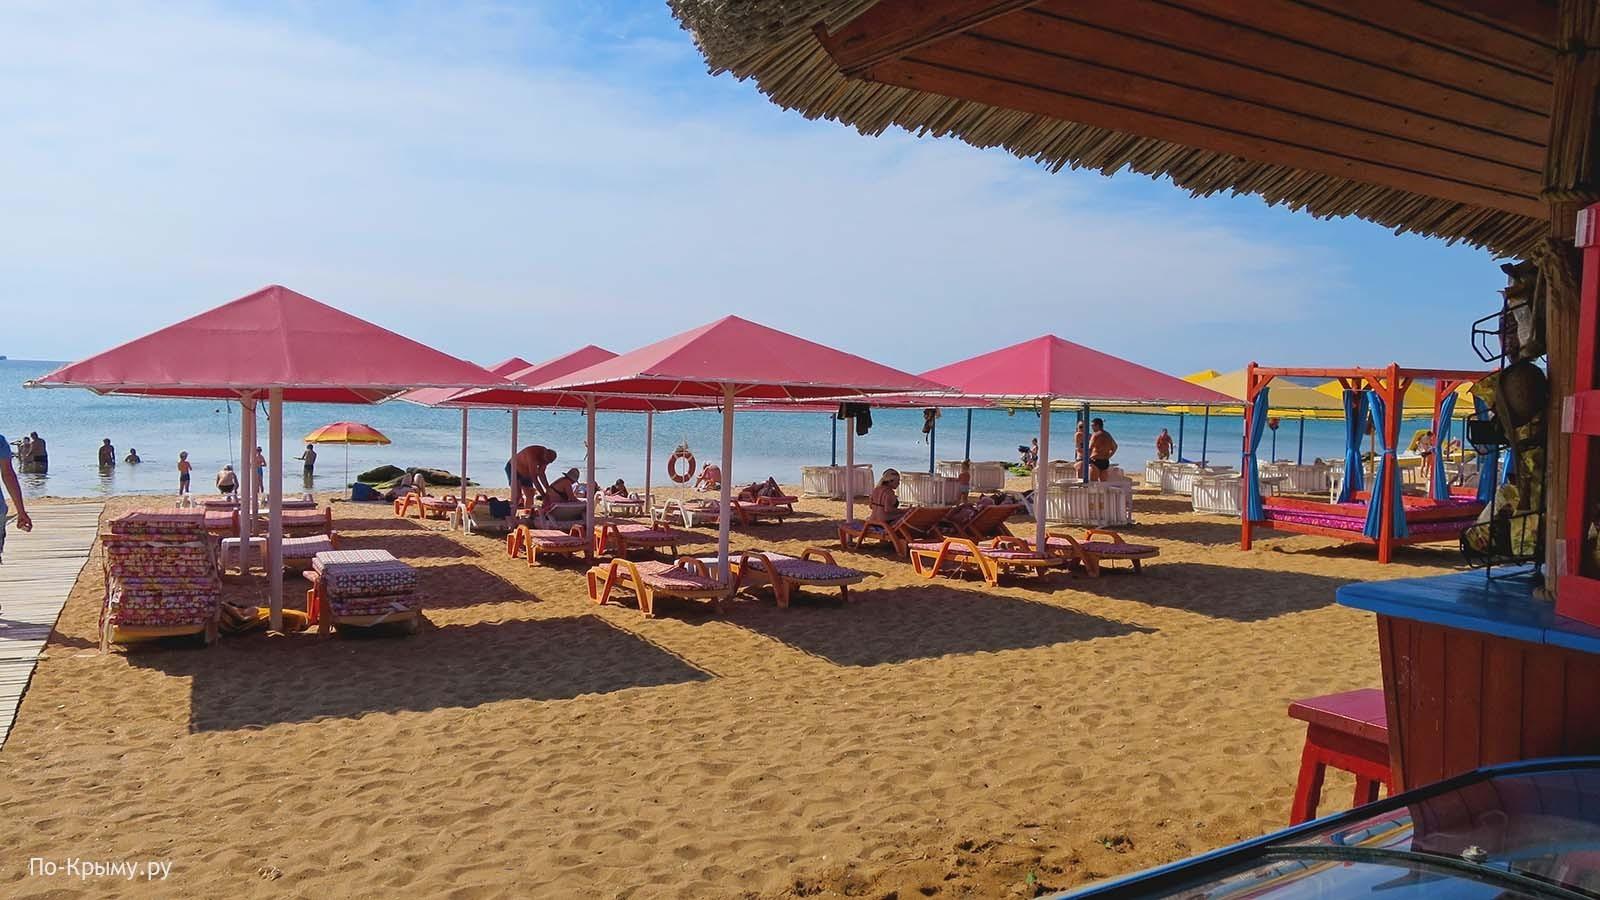 Пляж 117 в Феодосии